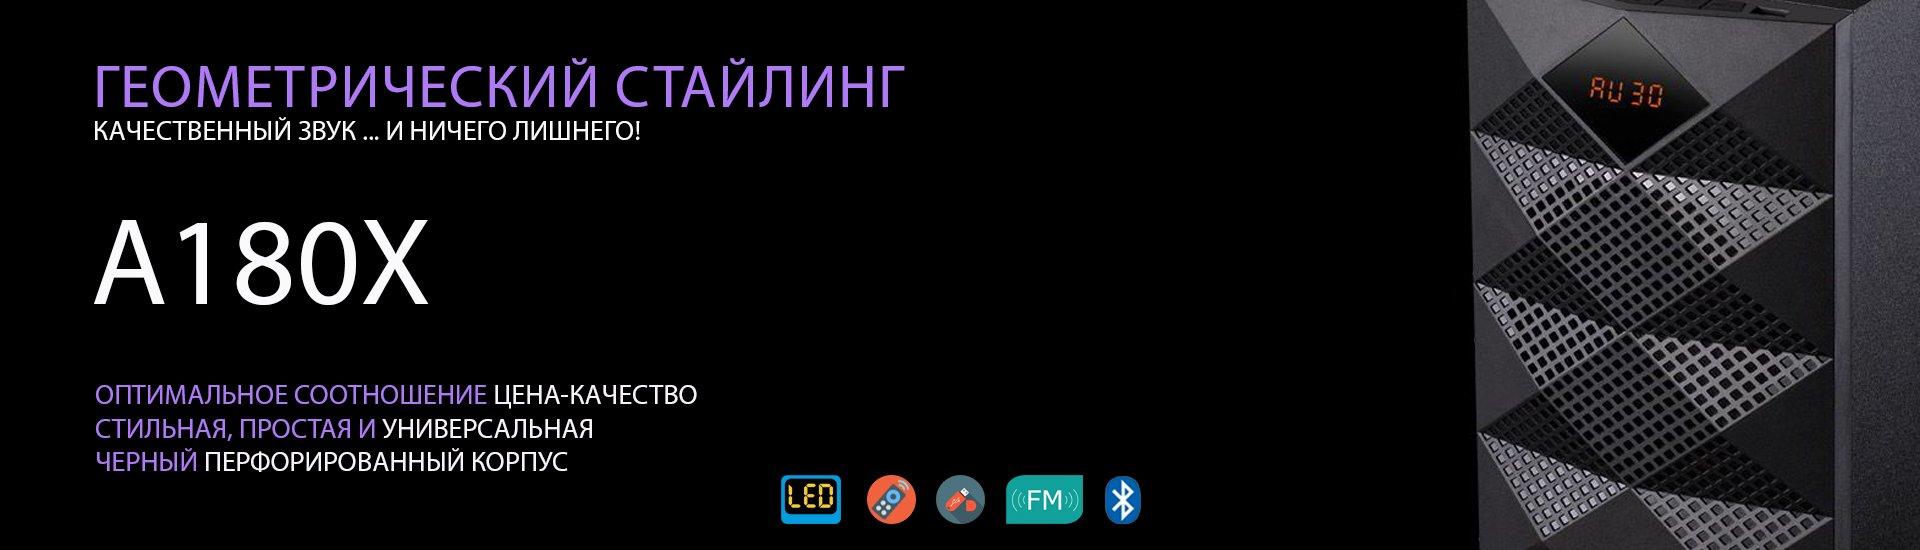 Блютуз мультимедийная акустика f d a180x banner